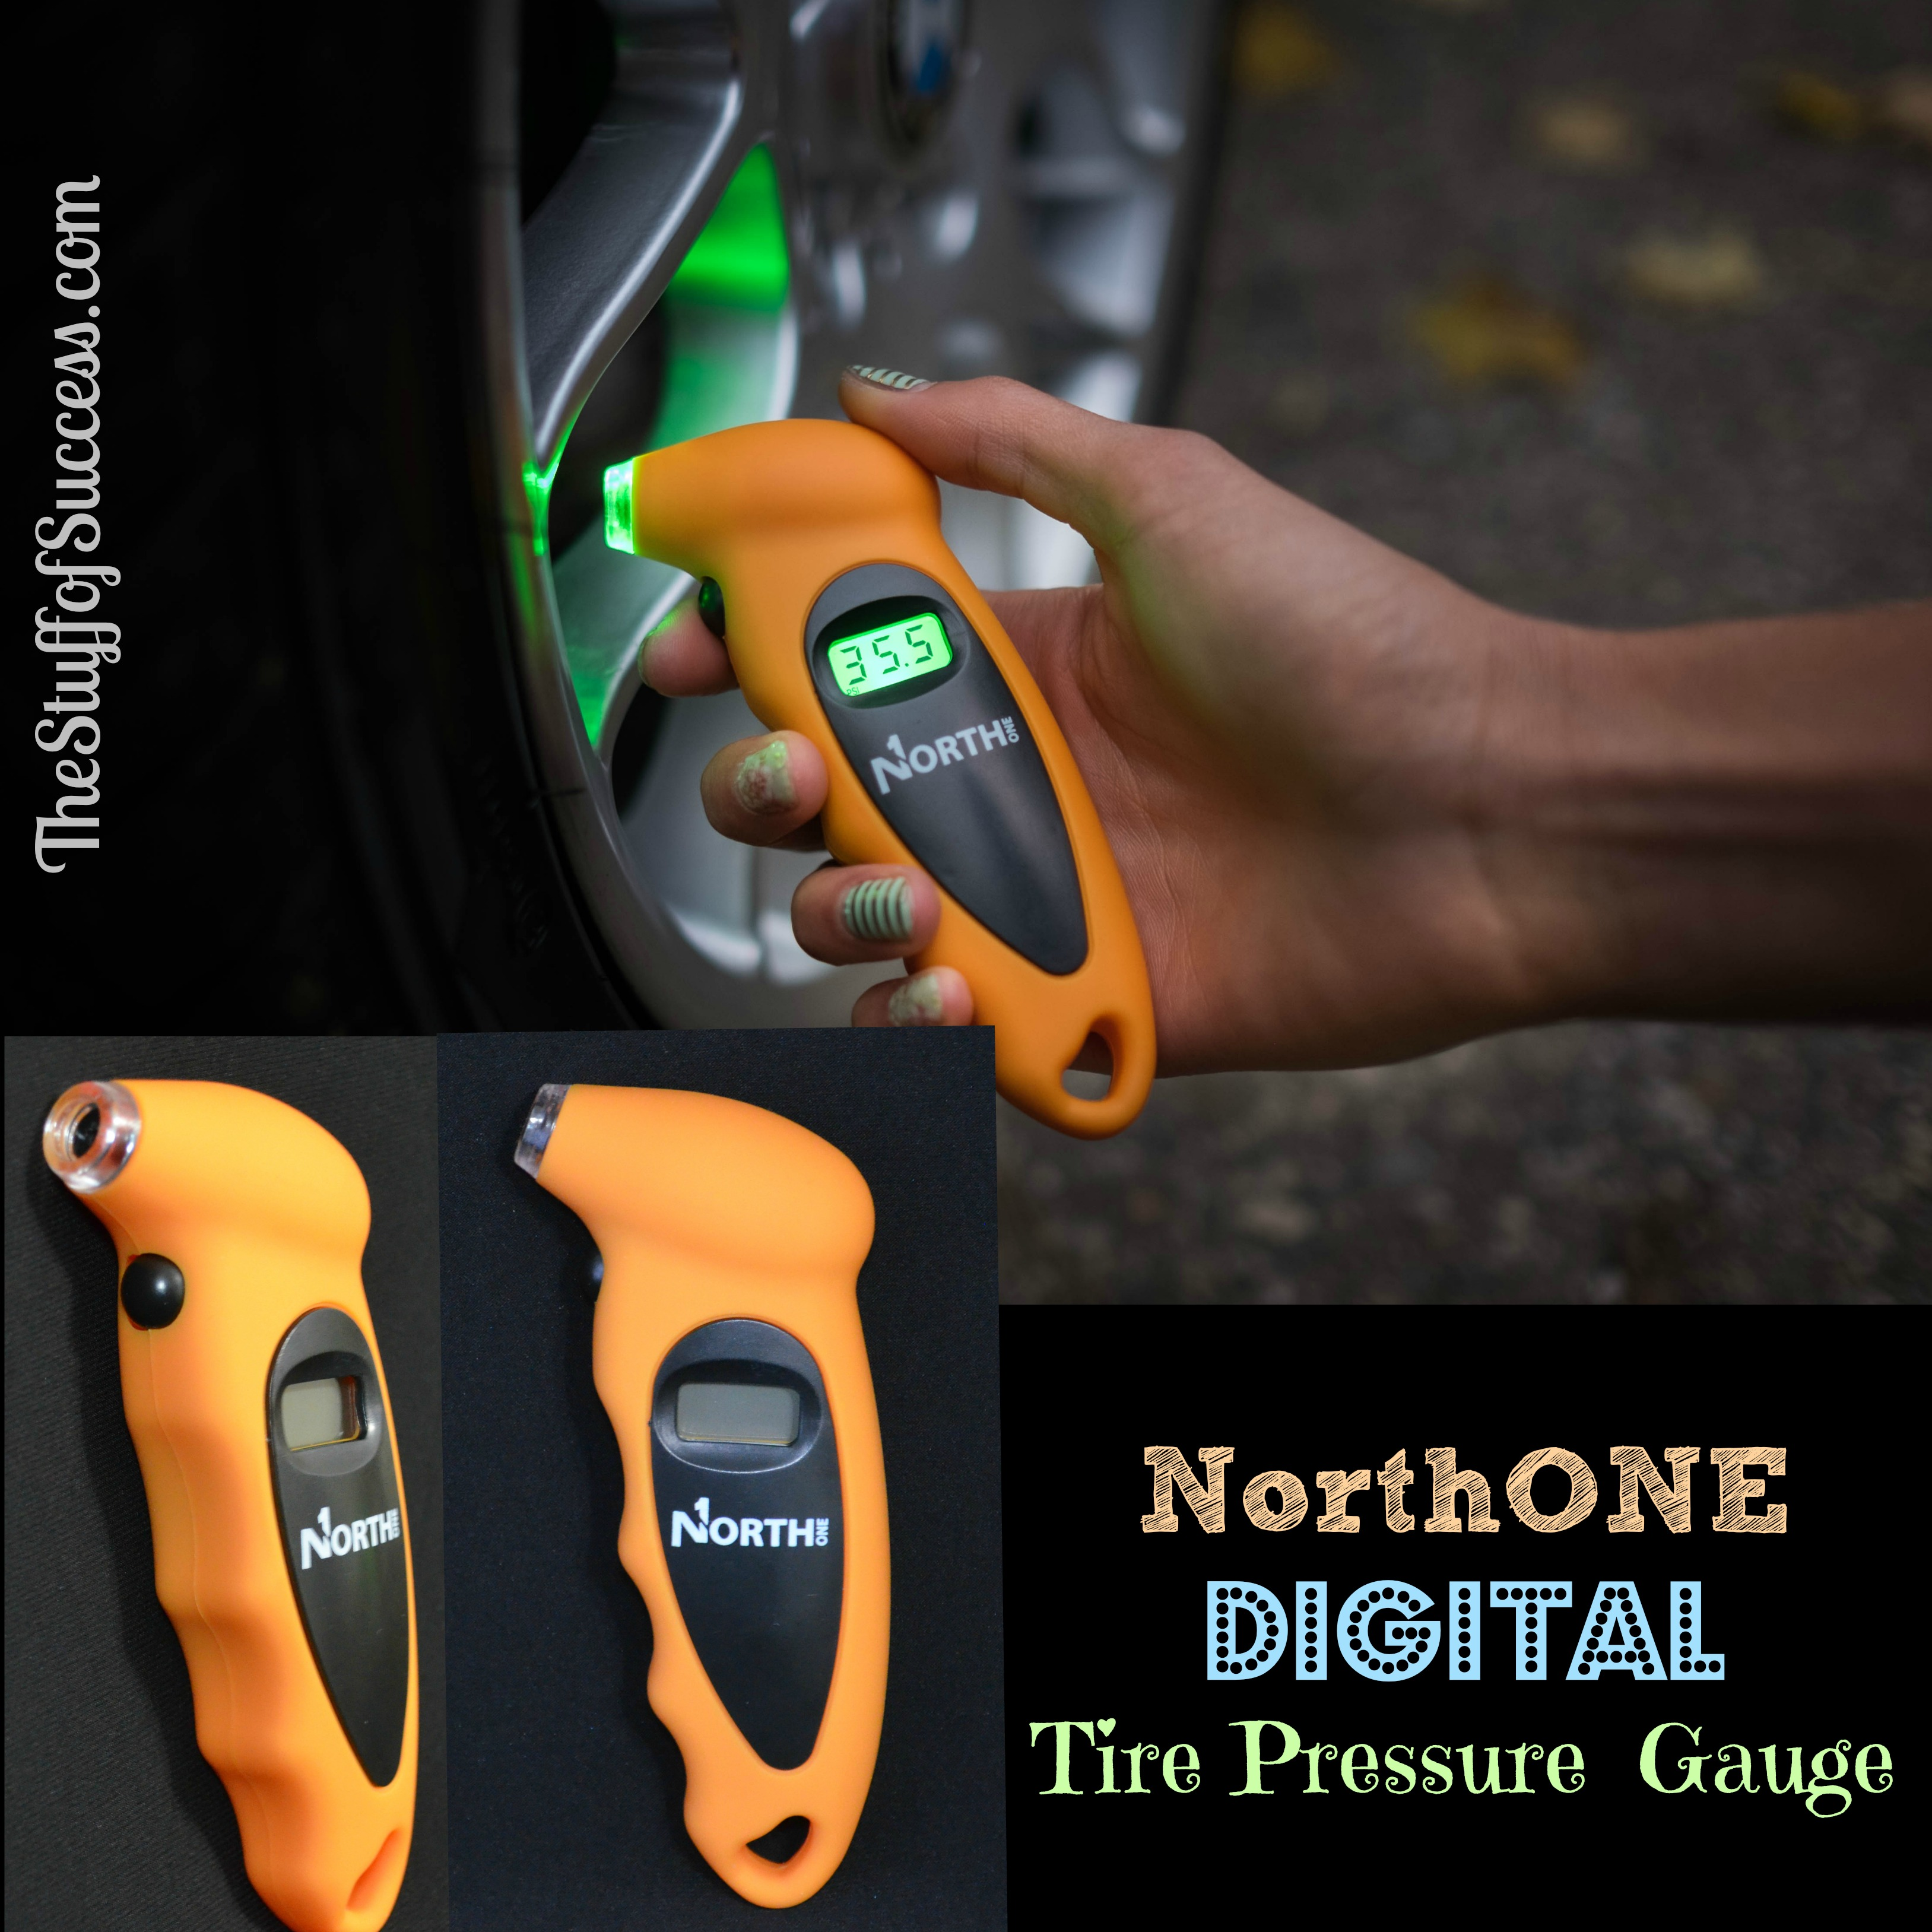 NorthONE Digital Tire Pressure Gauge